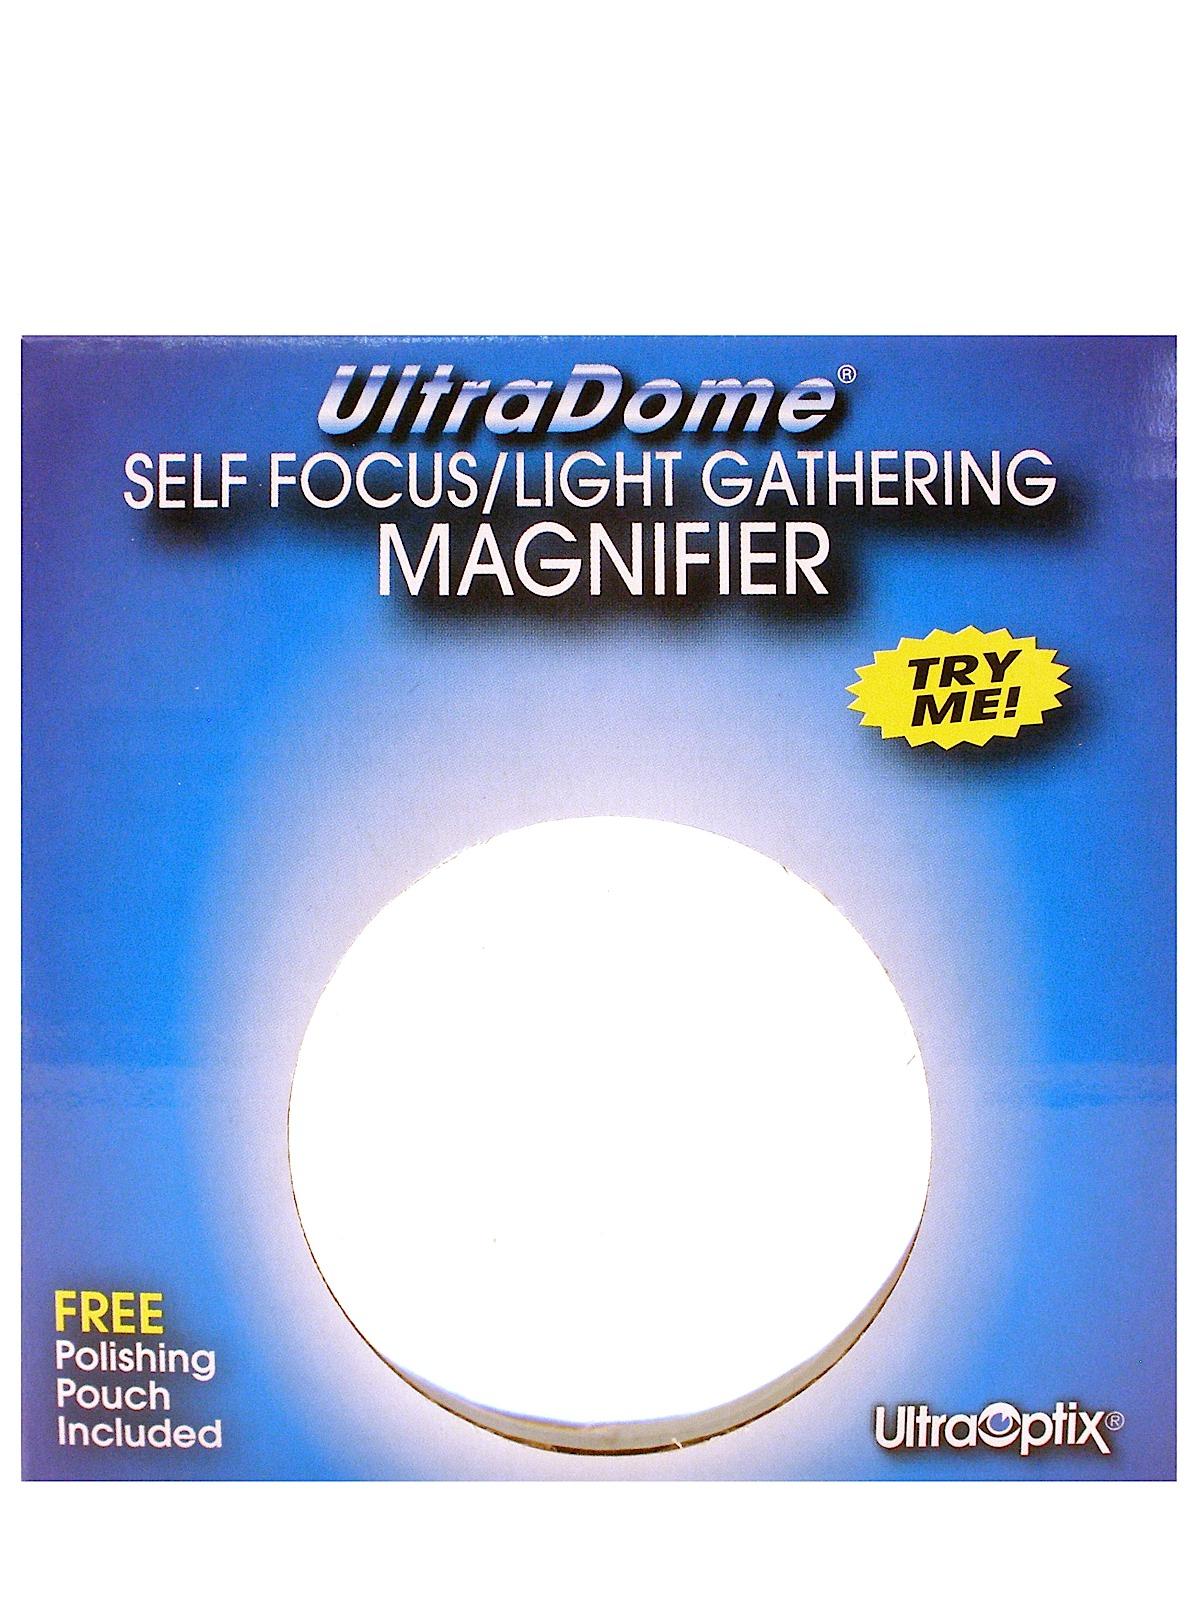 UltraOptix - UltraDome Magnifier